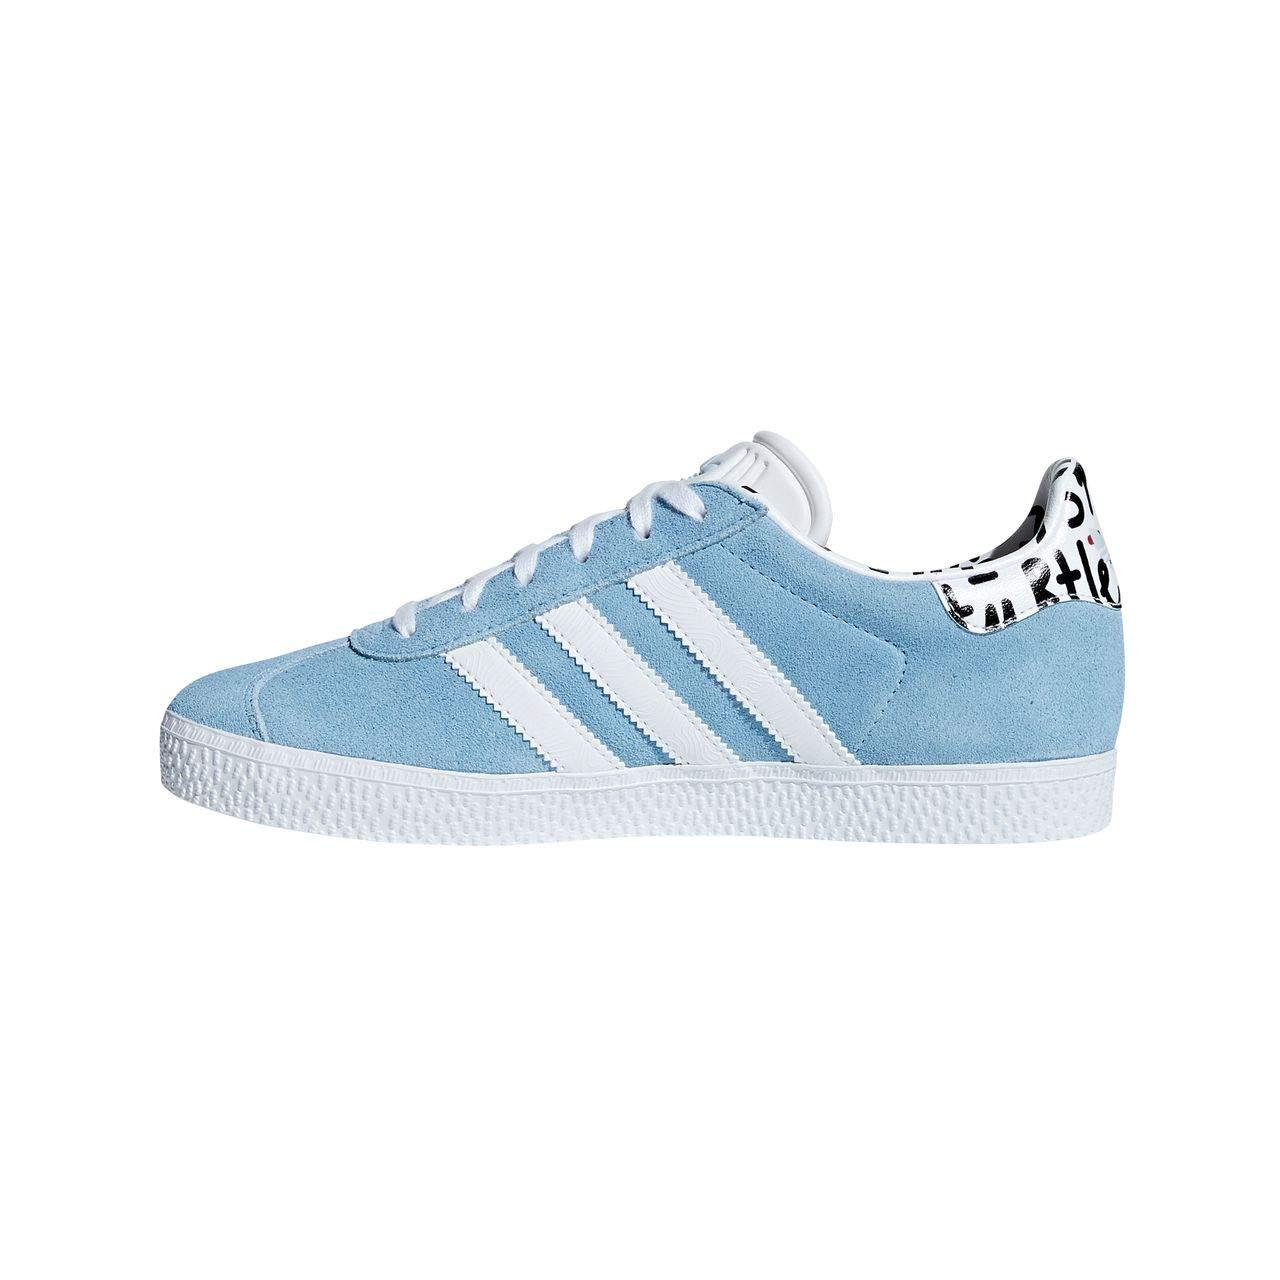 Adidas Gazelle W Scarpe da Ginnastica Donna amazon shoes blu